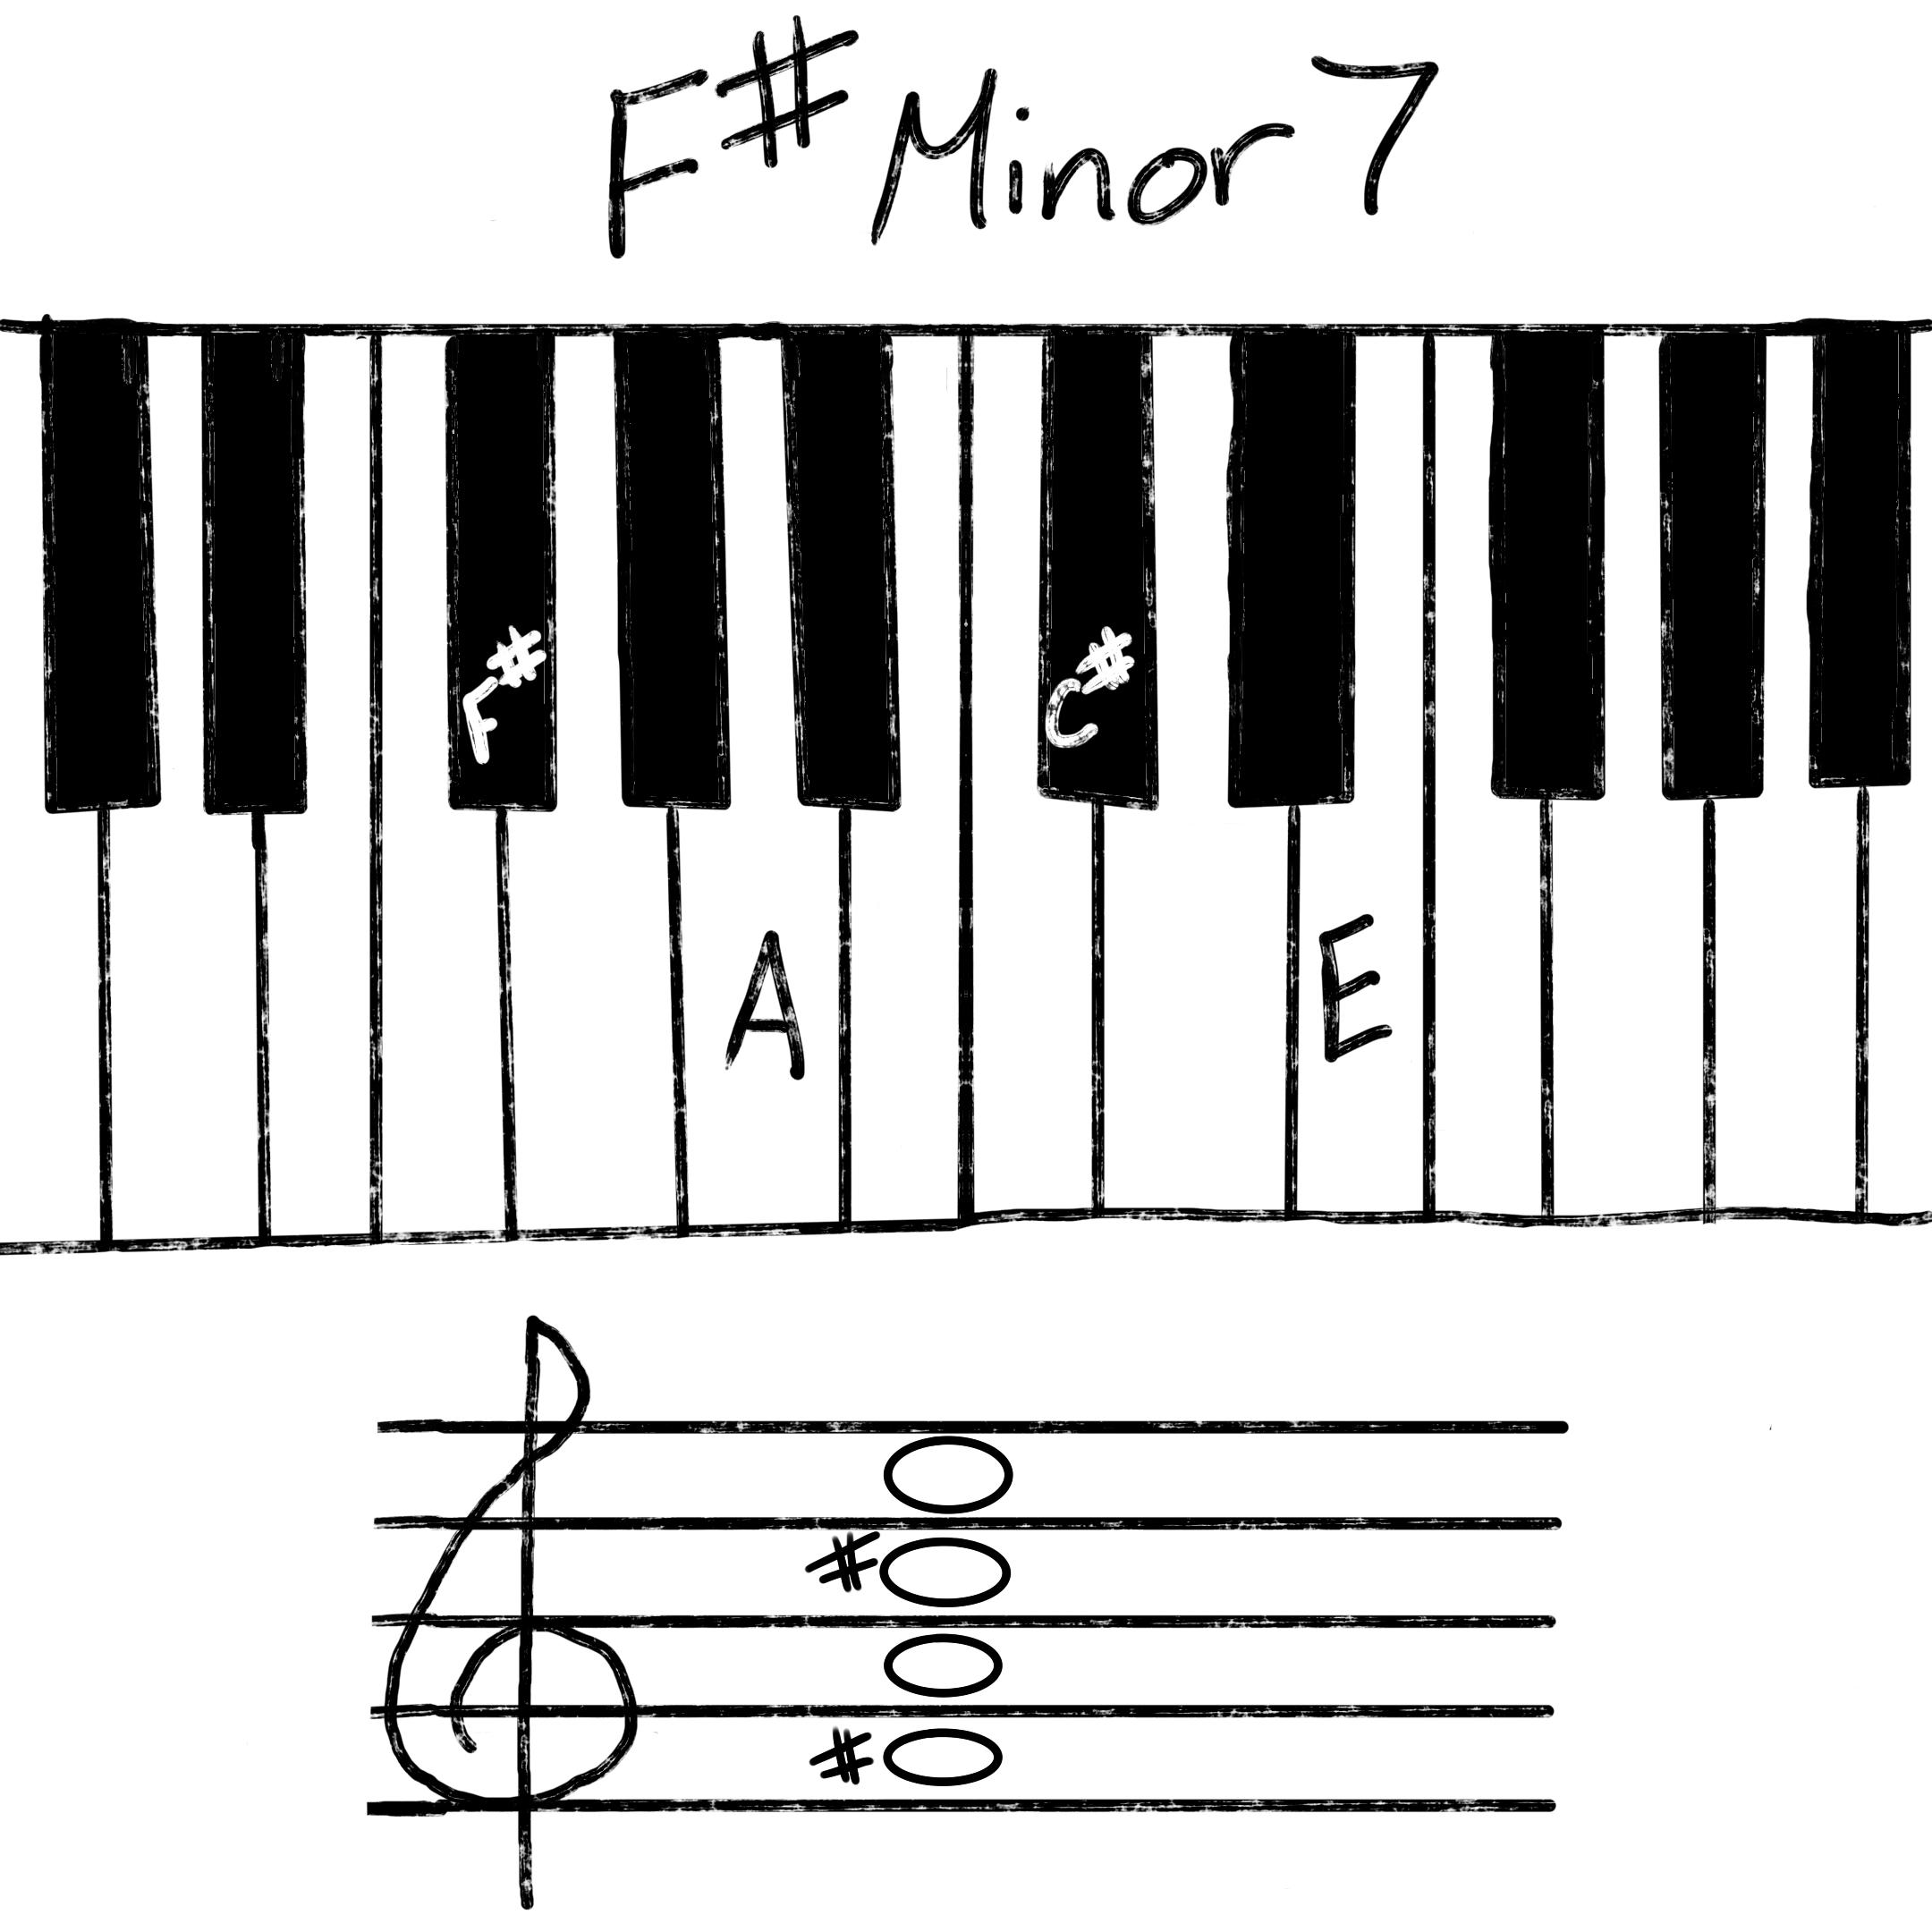 F#m7 chord